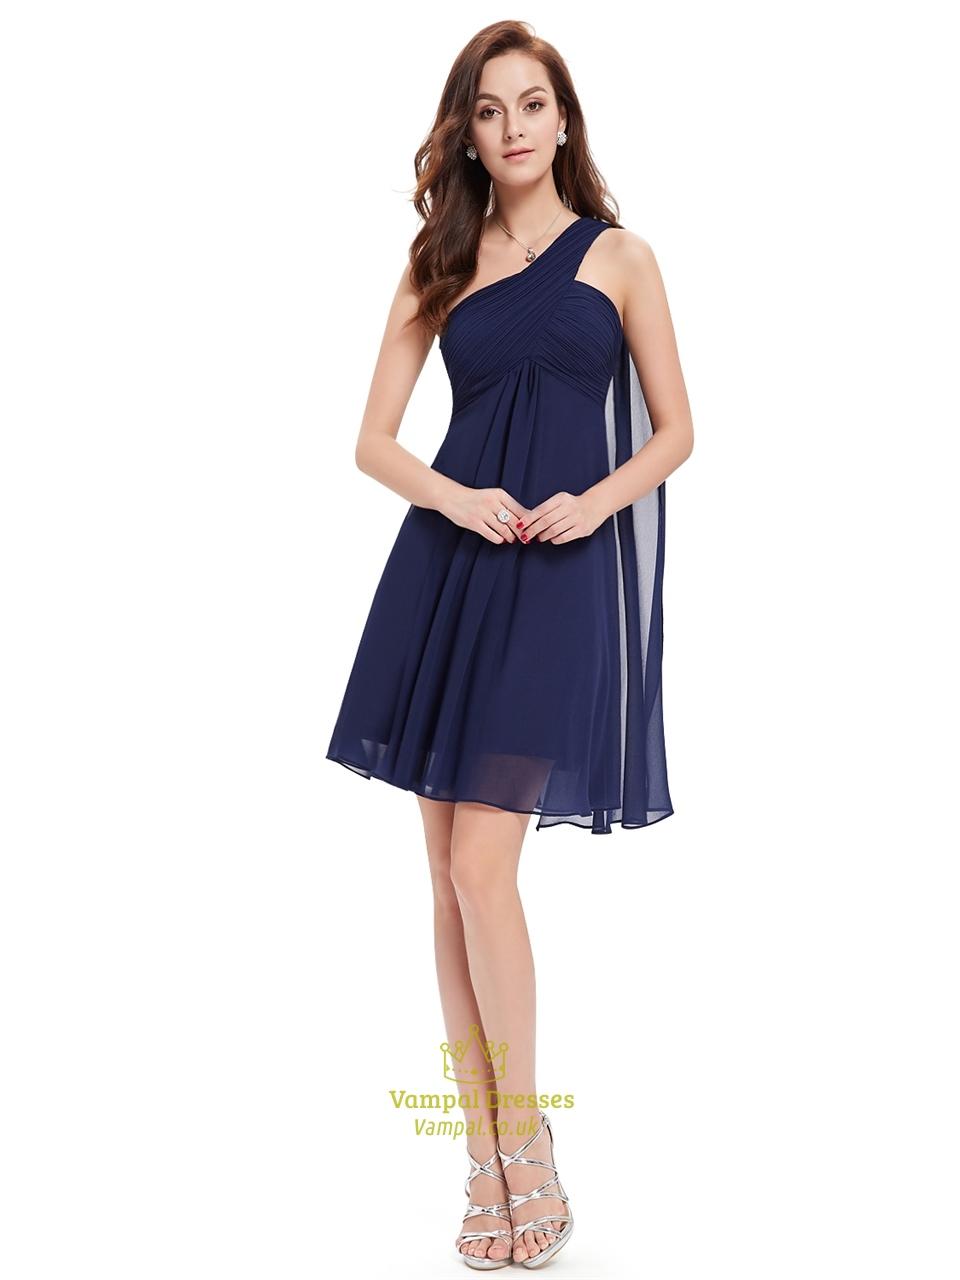 Navy Blue One Shoulder Chiffon Short Bridesmaid Dress With